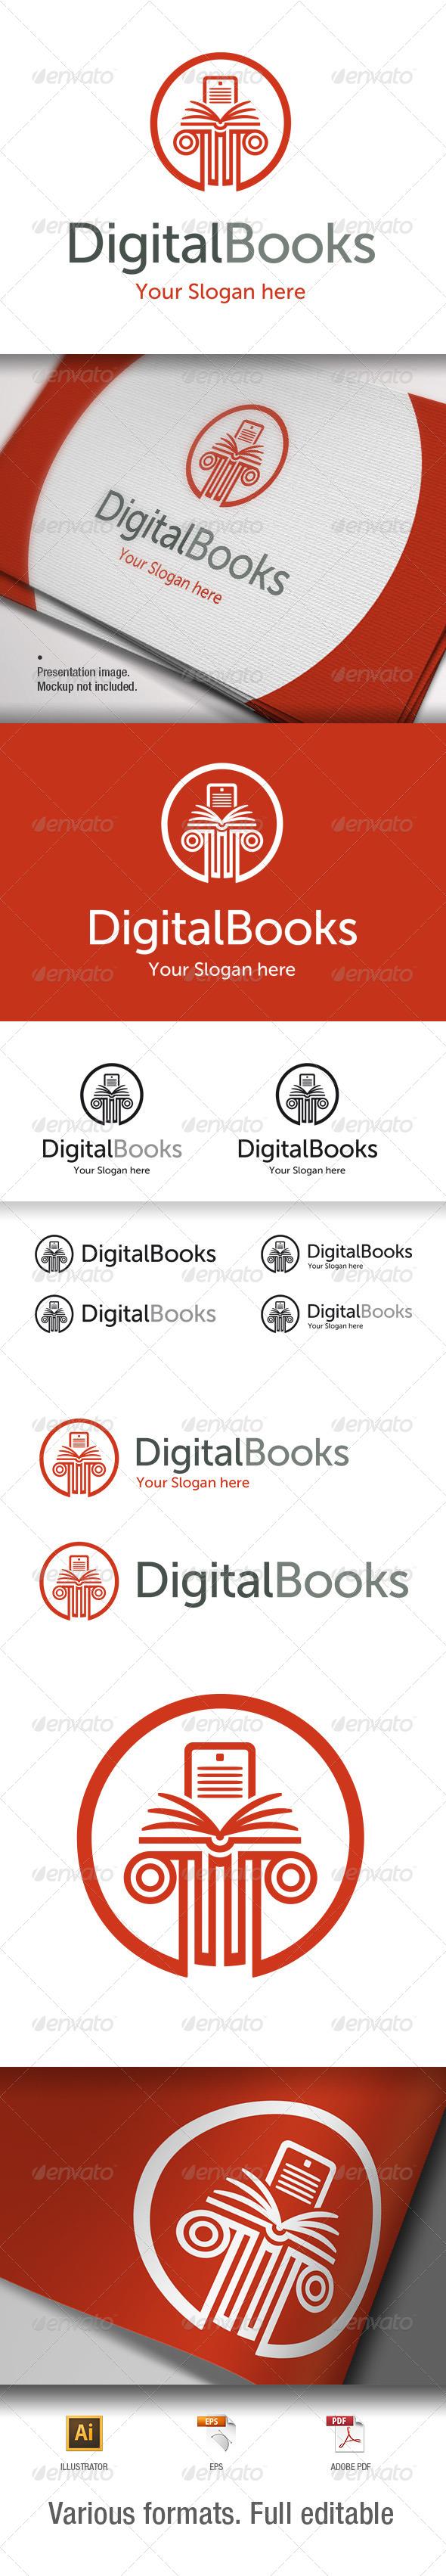 Digital Books Logo Template - V1